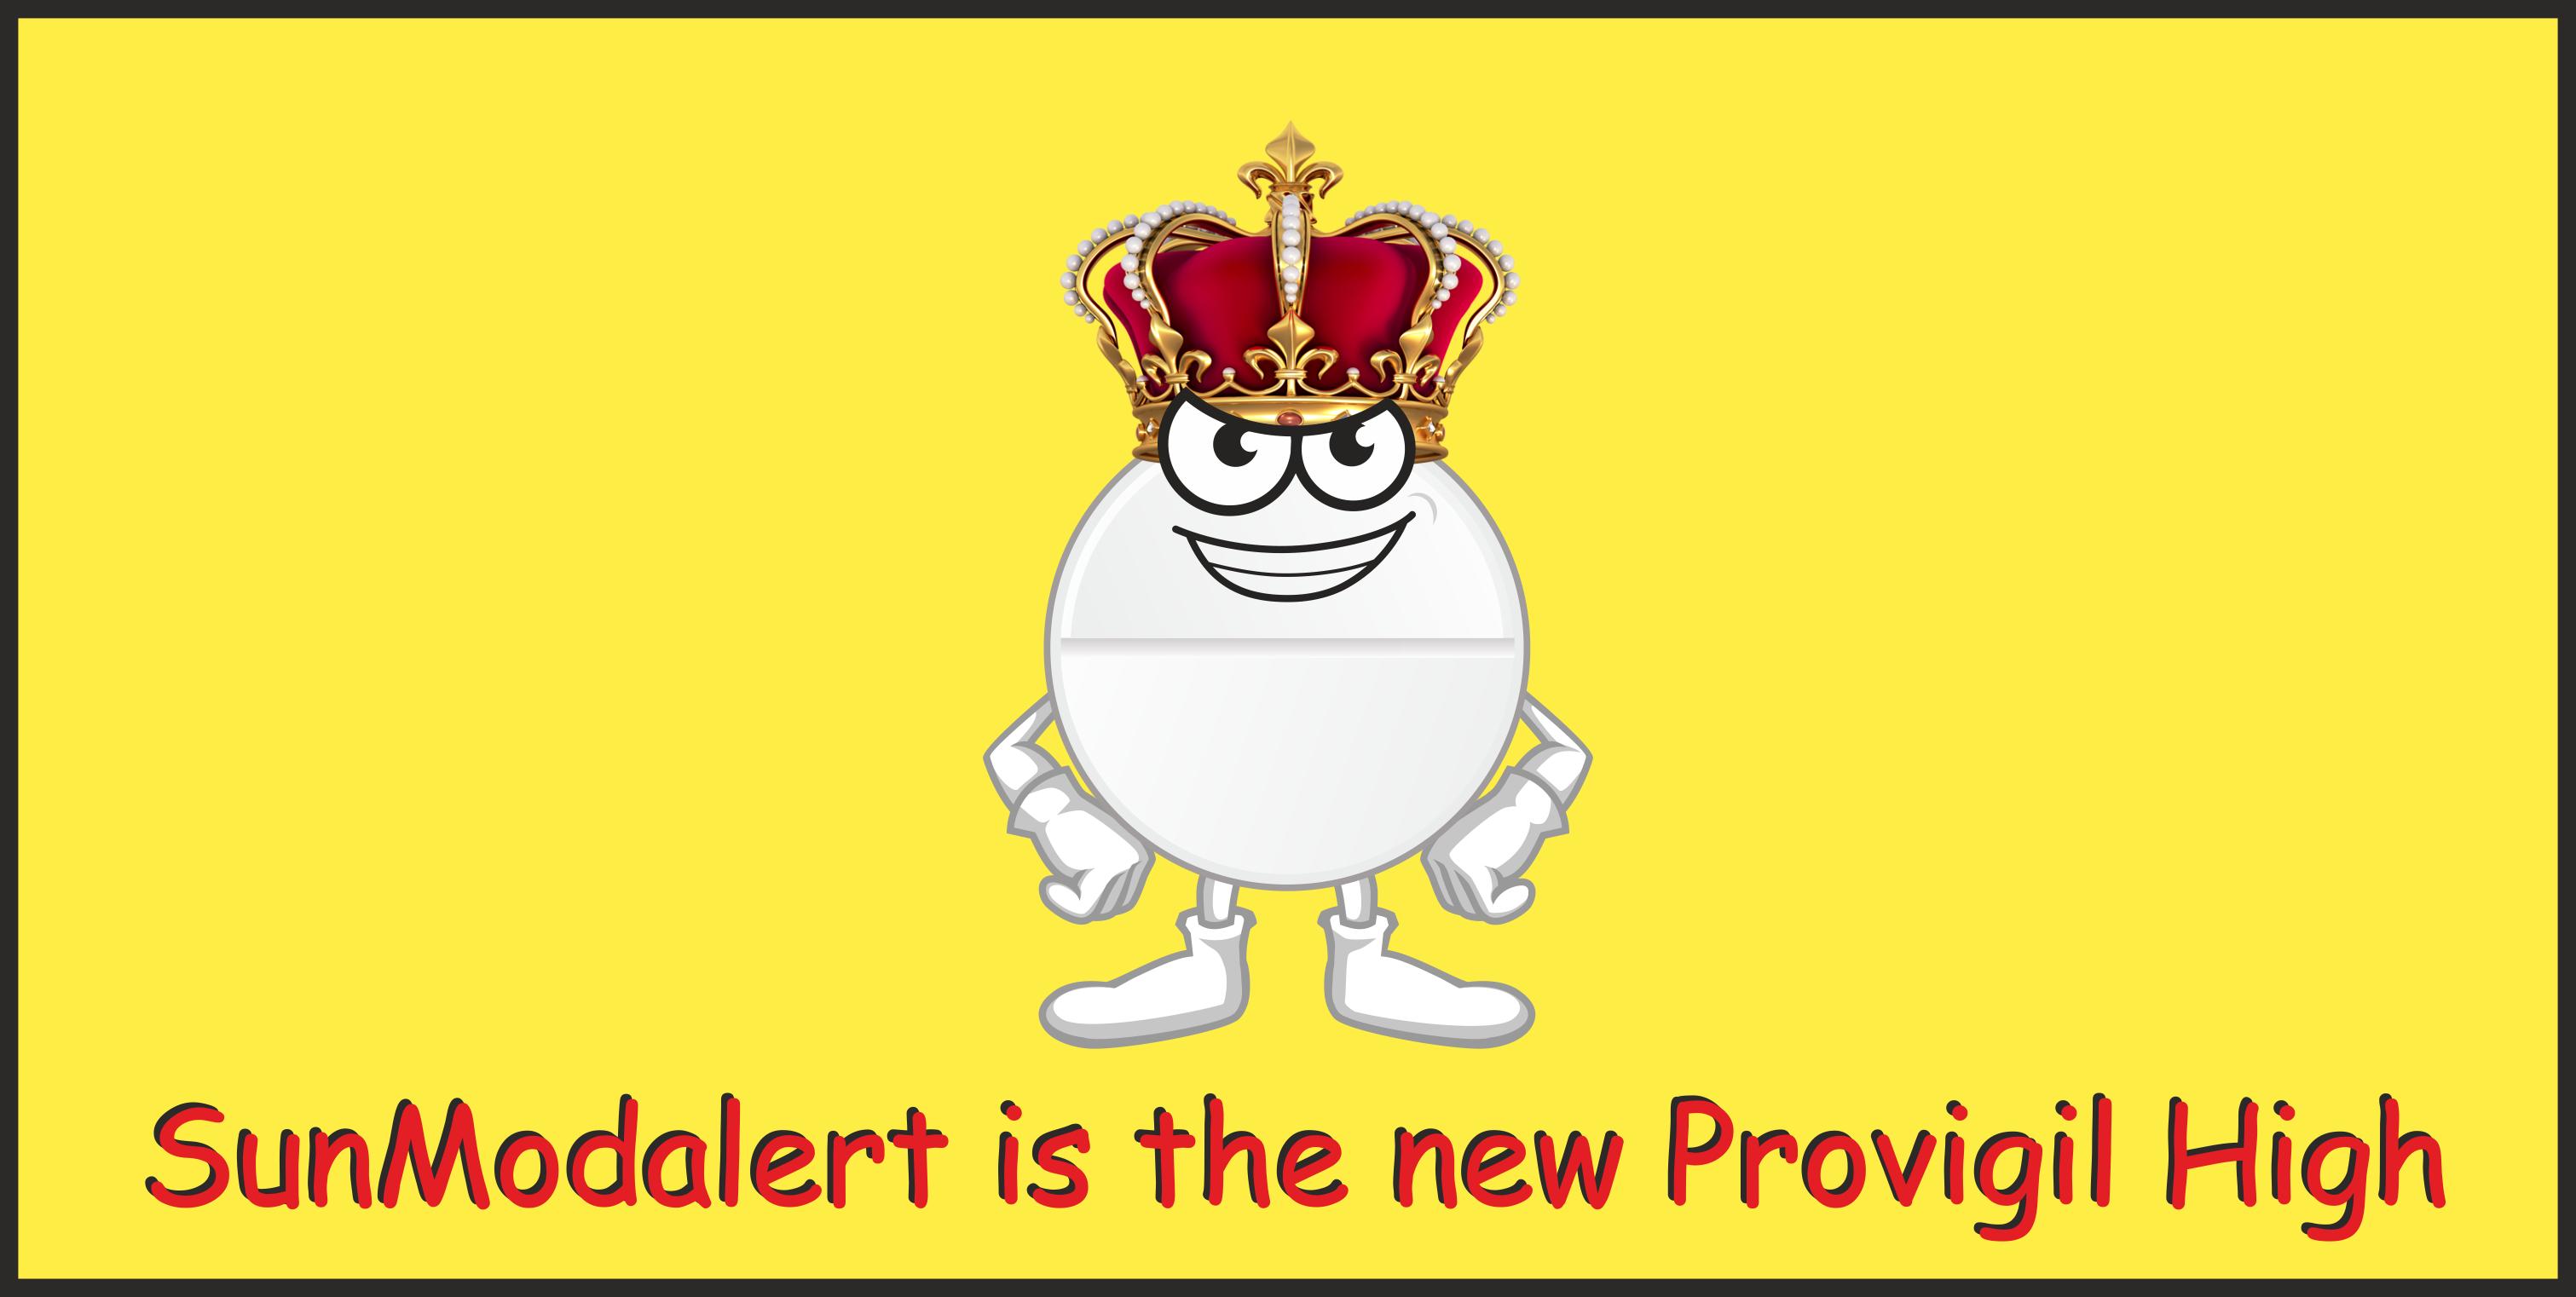 SunModalert is the new Provigil High